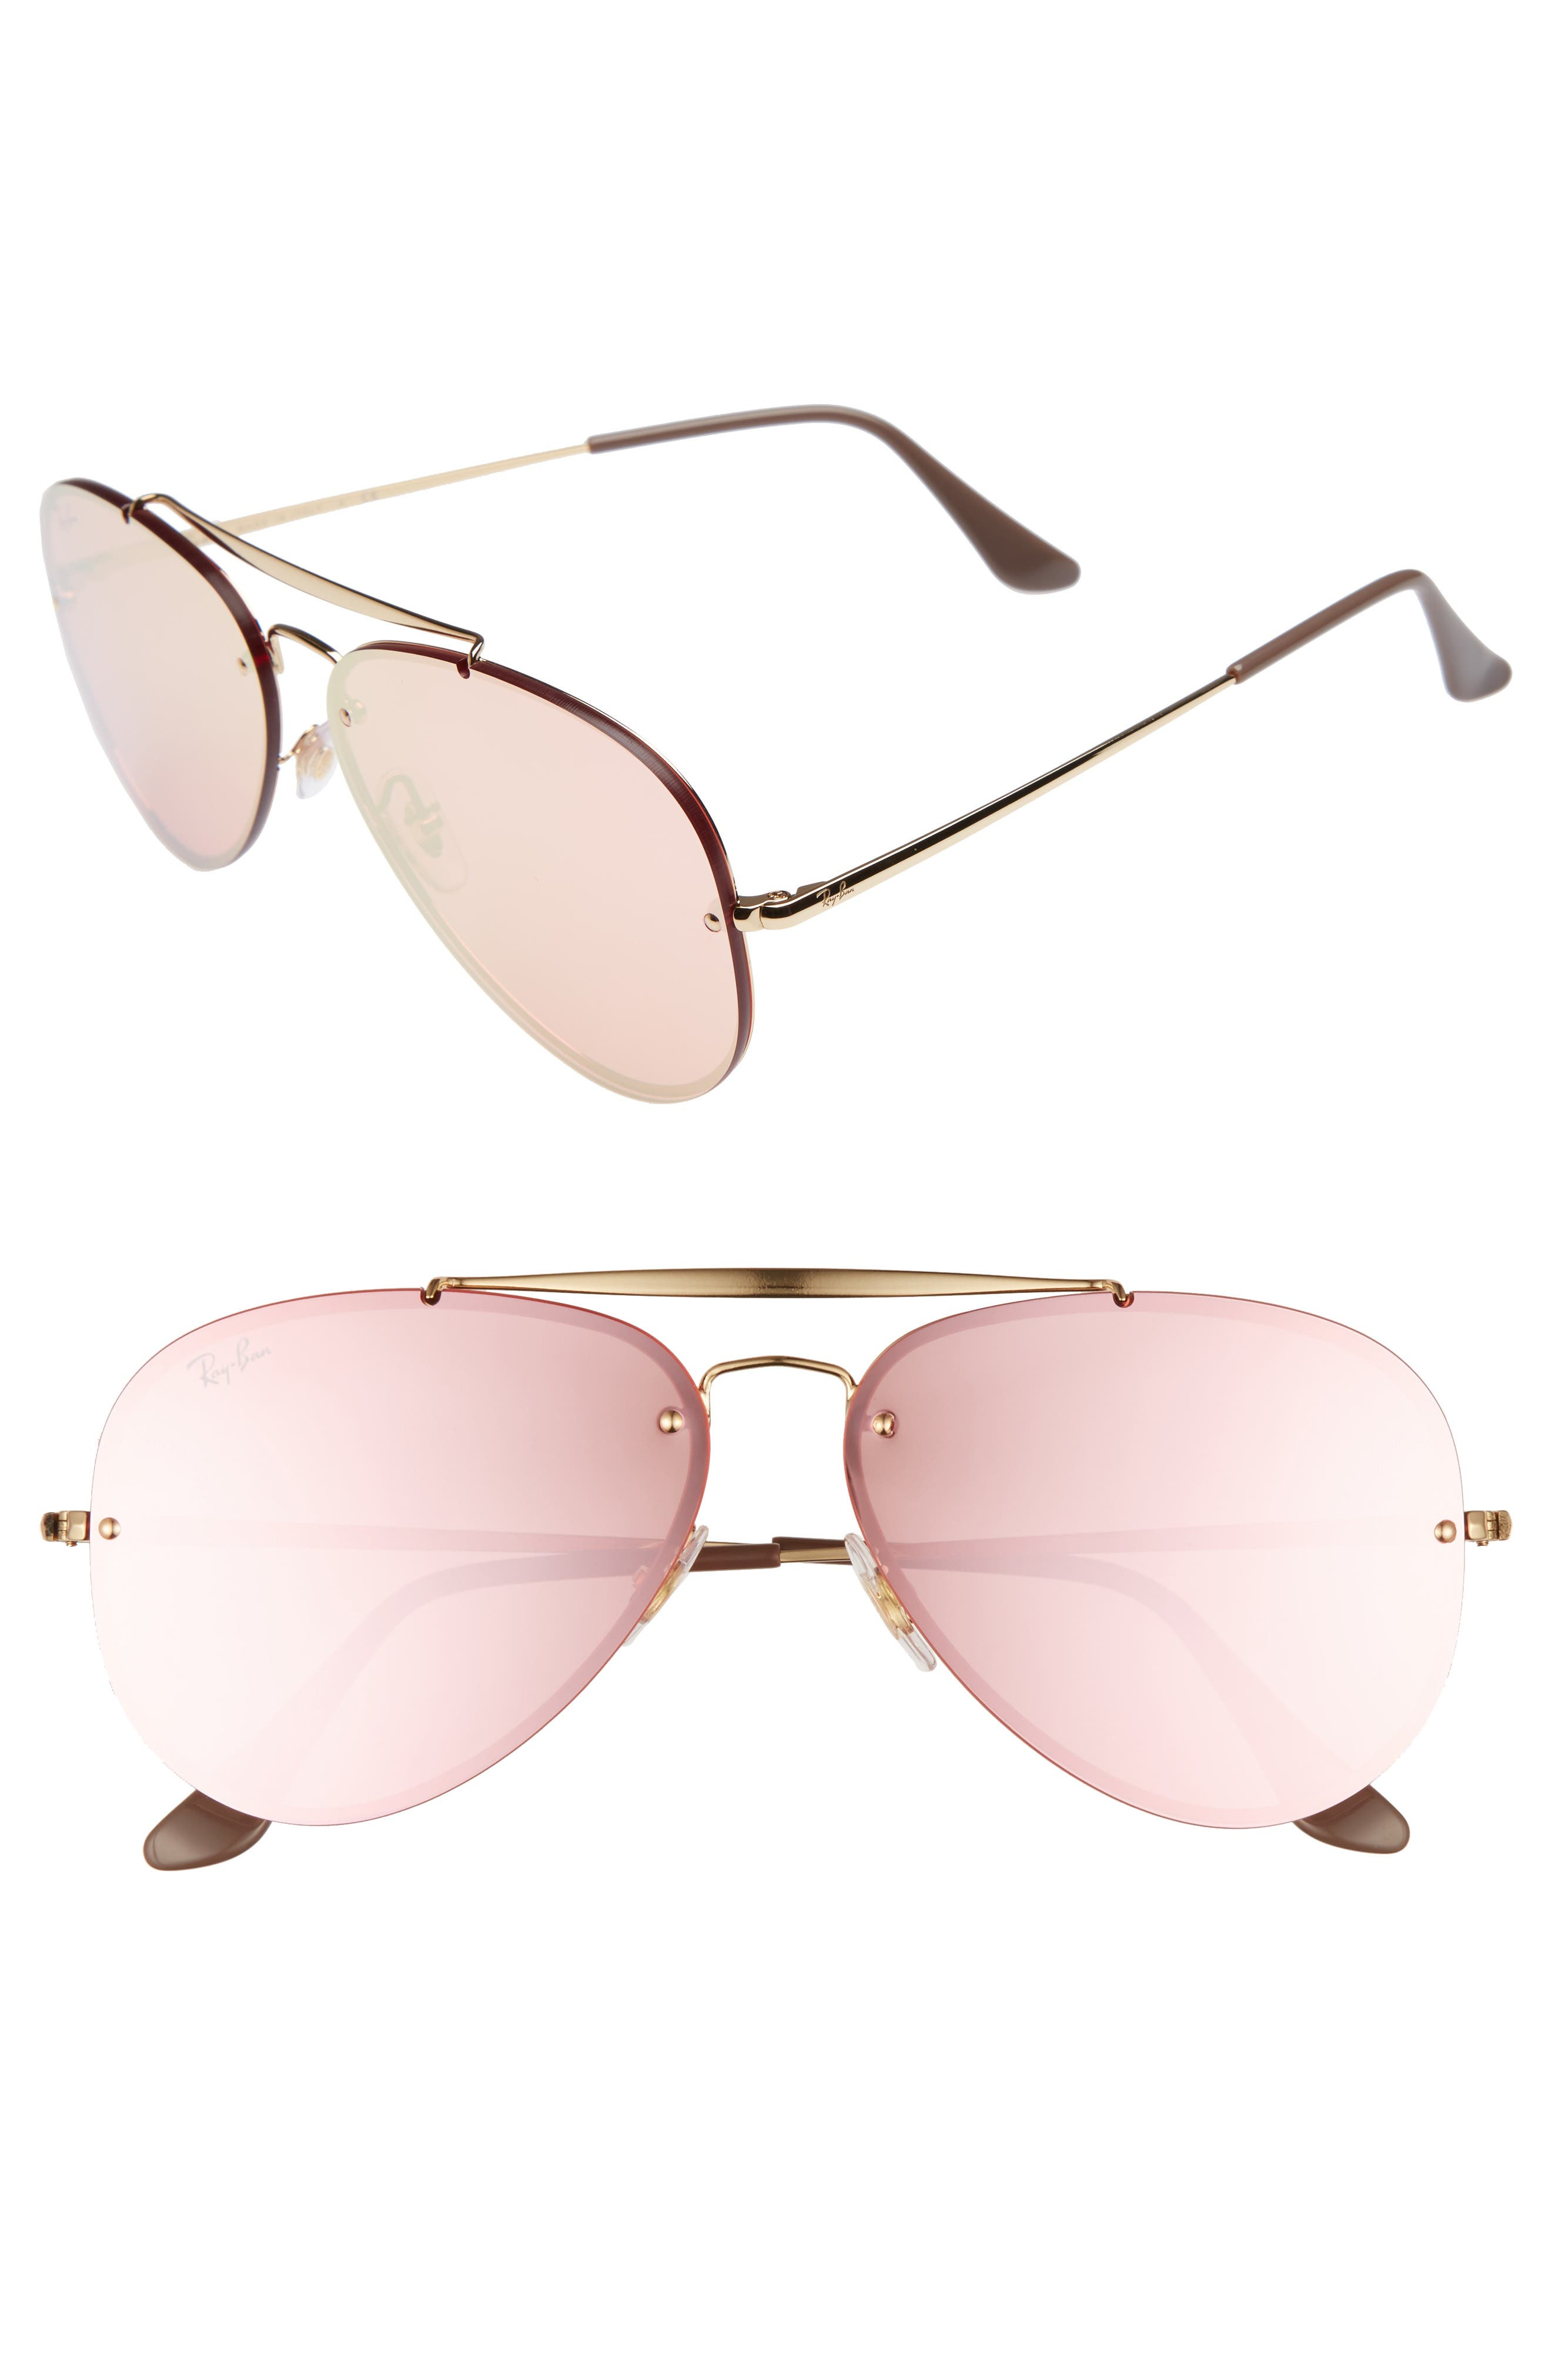 d32950b6ff ... coupon for main image ray ban 61mm mirrored lens aviator sunglasses  134b4 5c5c3